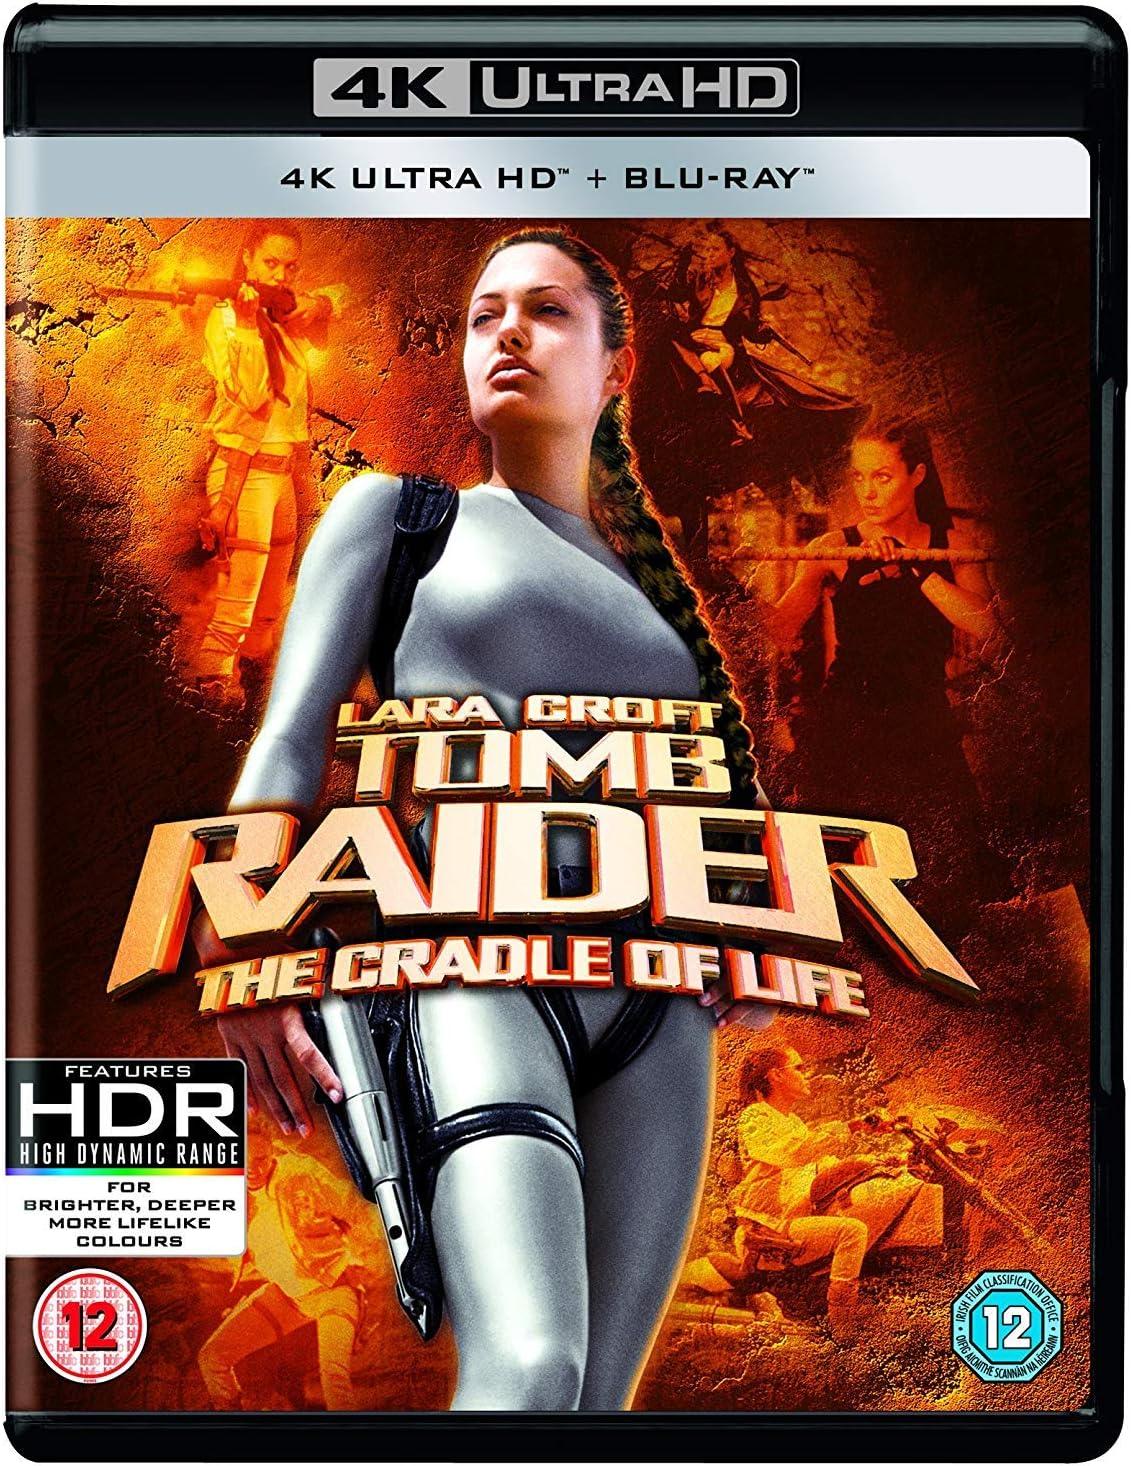 Lara Croft Tomb Raider The Cradle Of Life 4k Uhd Plus Bd Blu